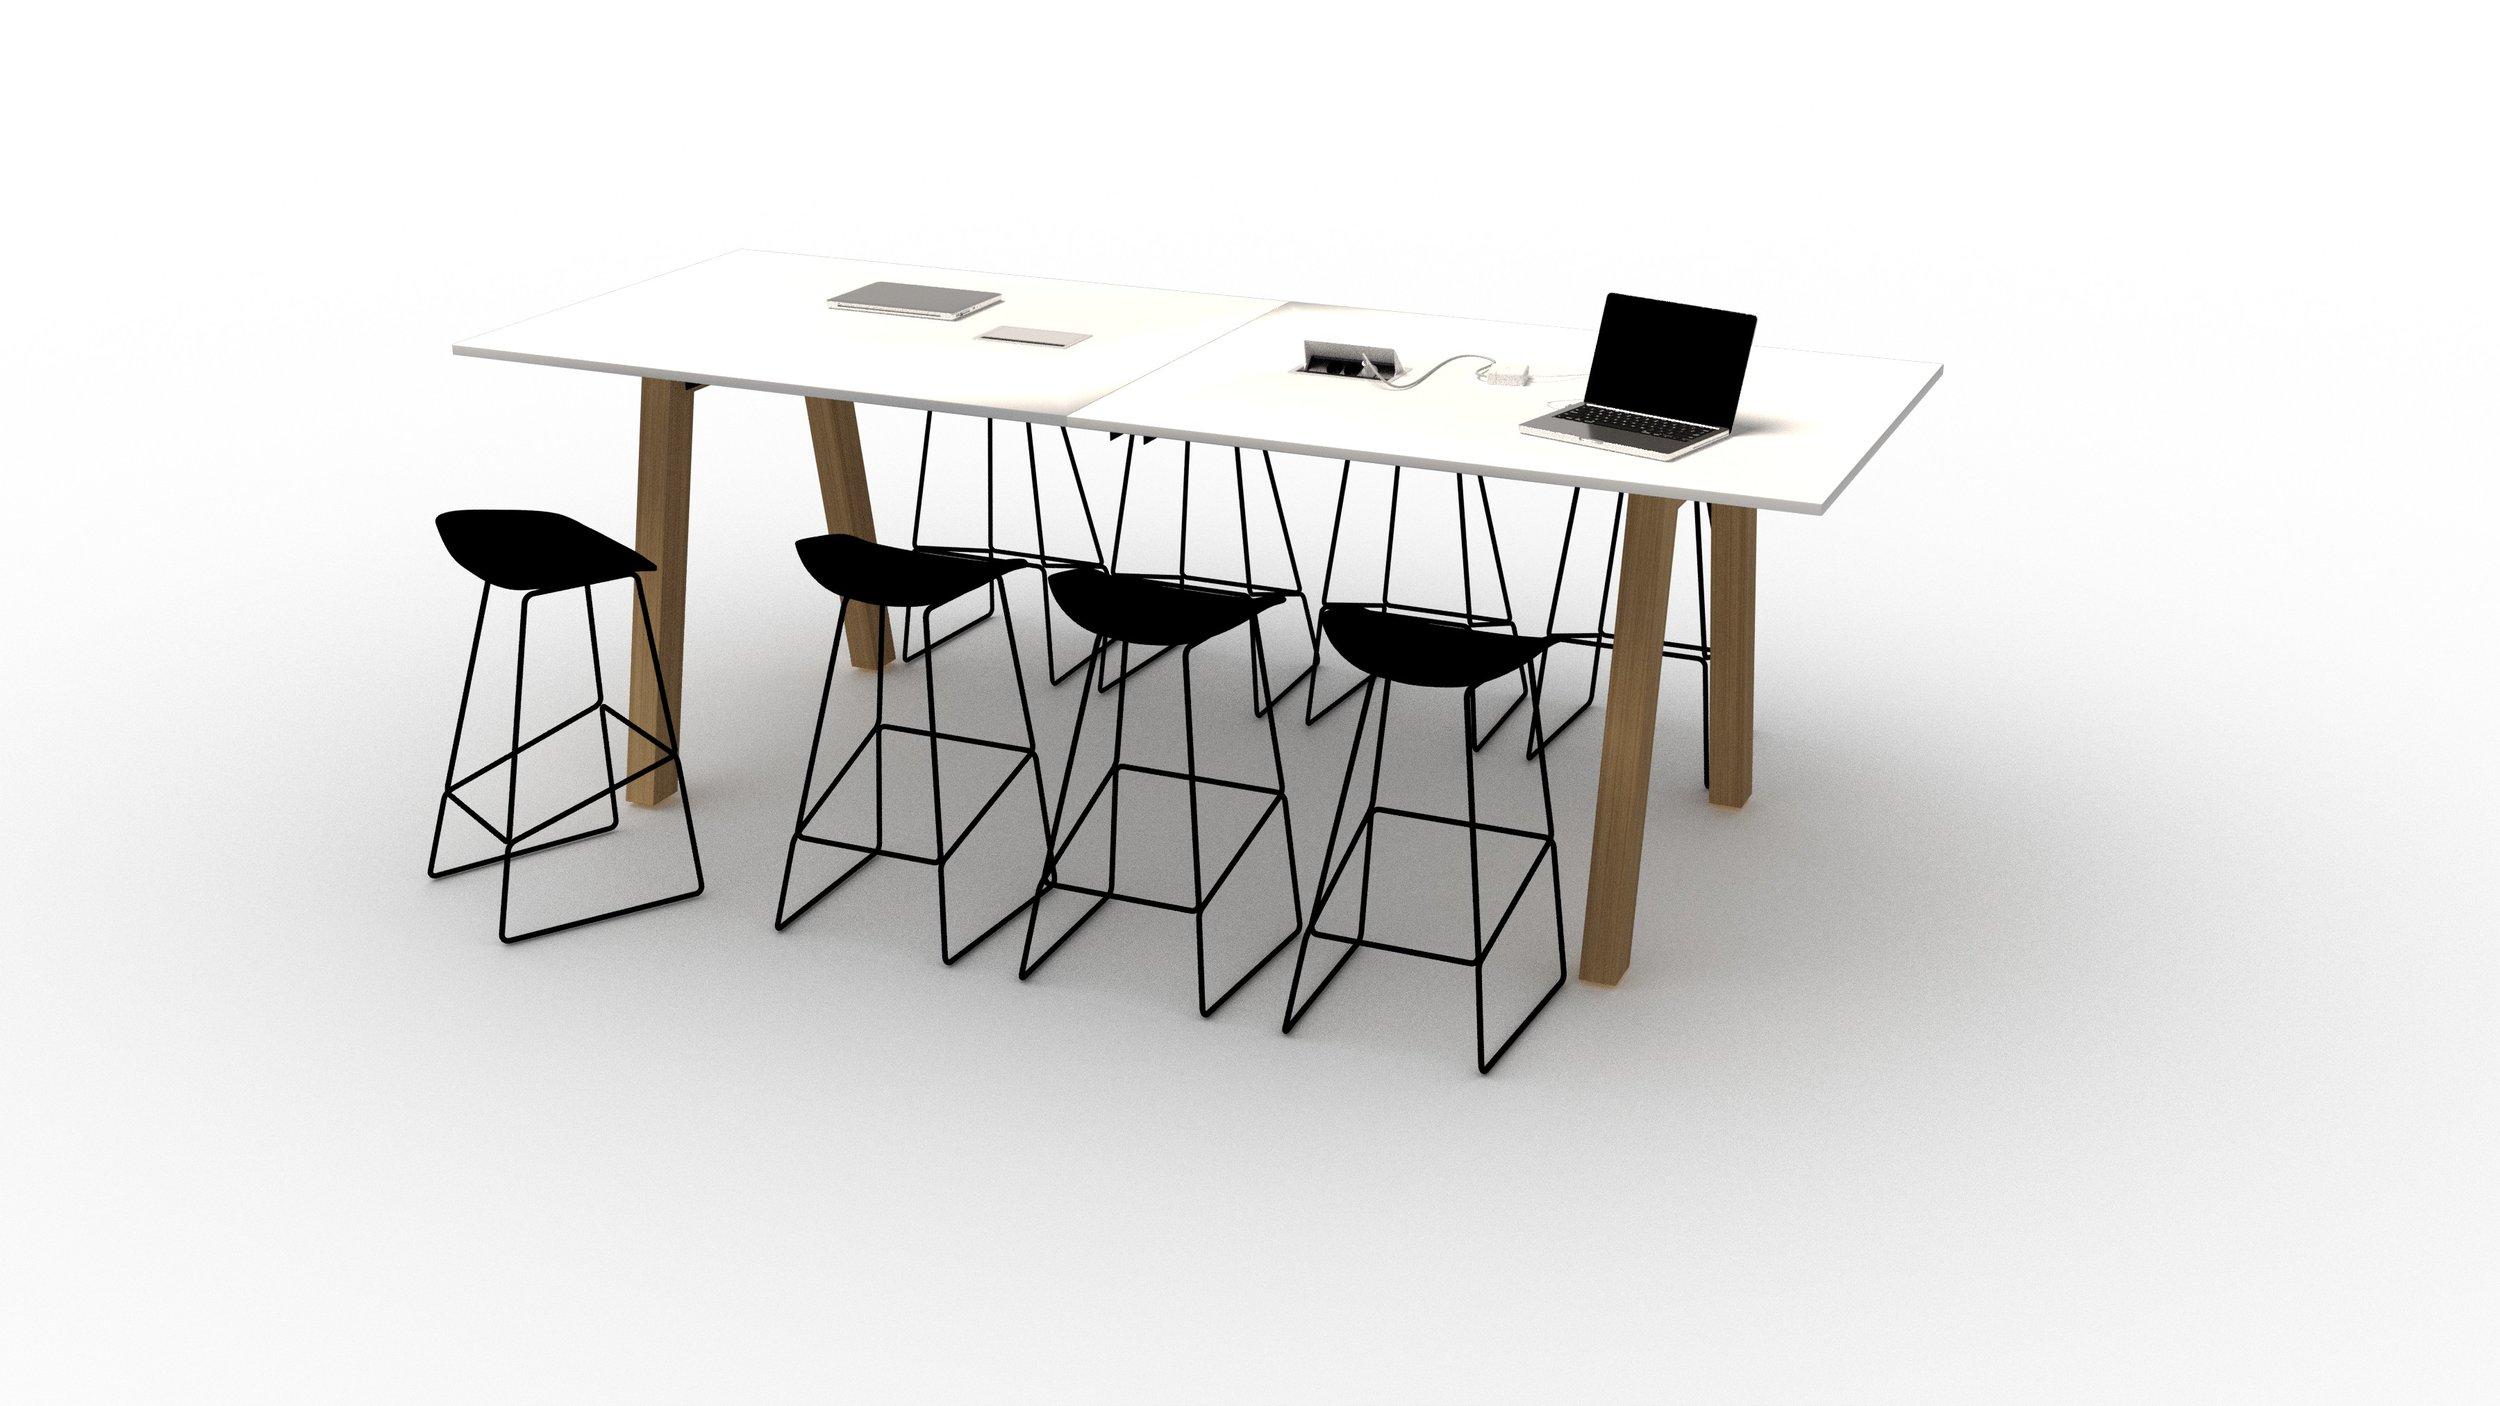 setup_conference_table[1] 2.jpg